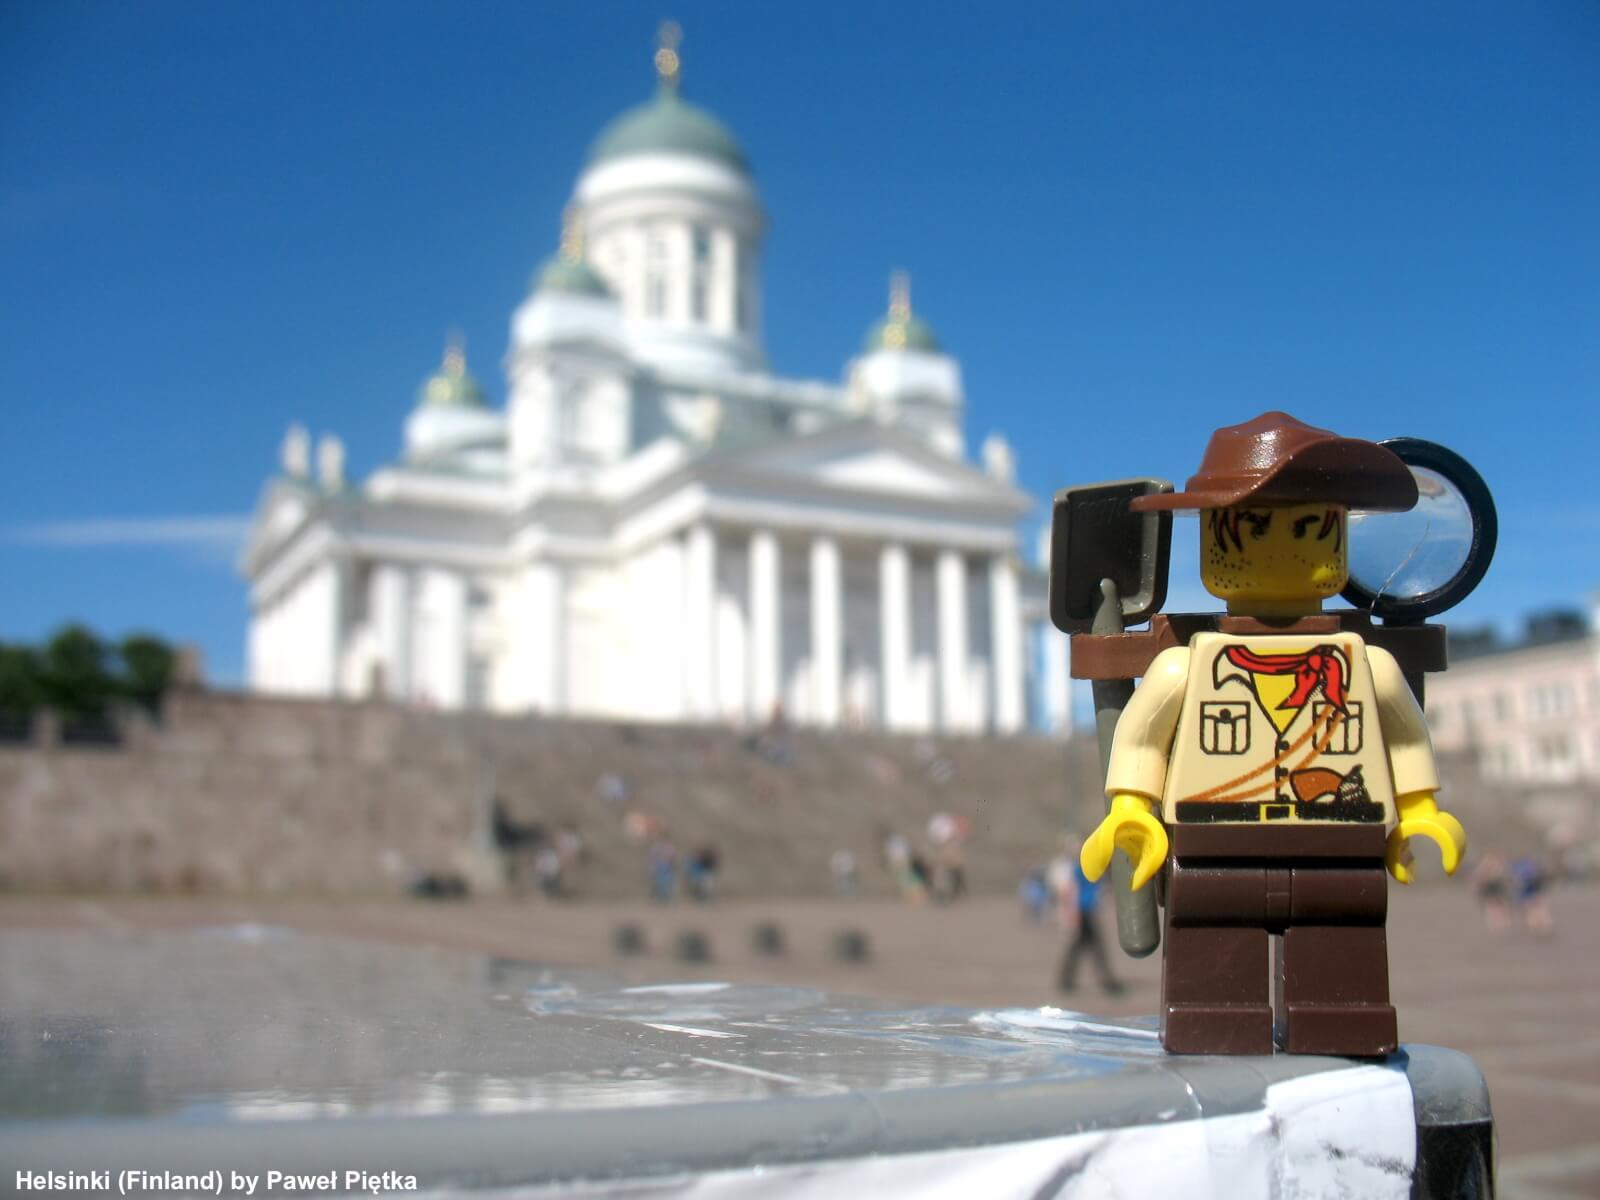 Helsinki (Finland) - Finnish Evangelical Lutheran Cathedral